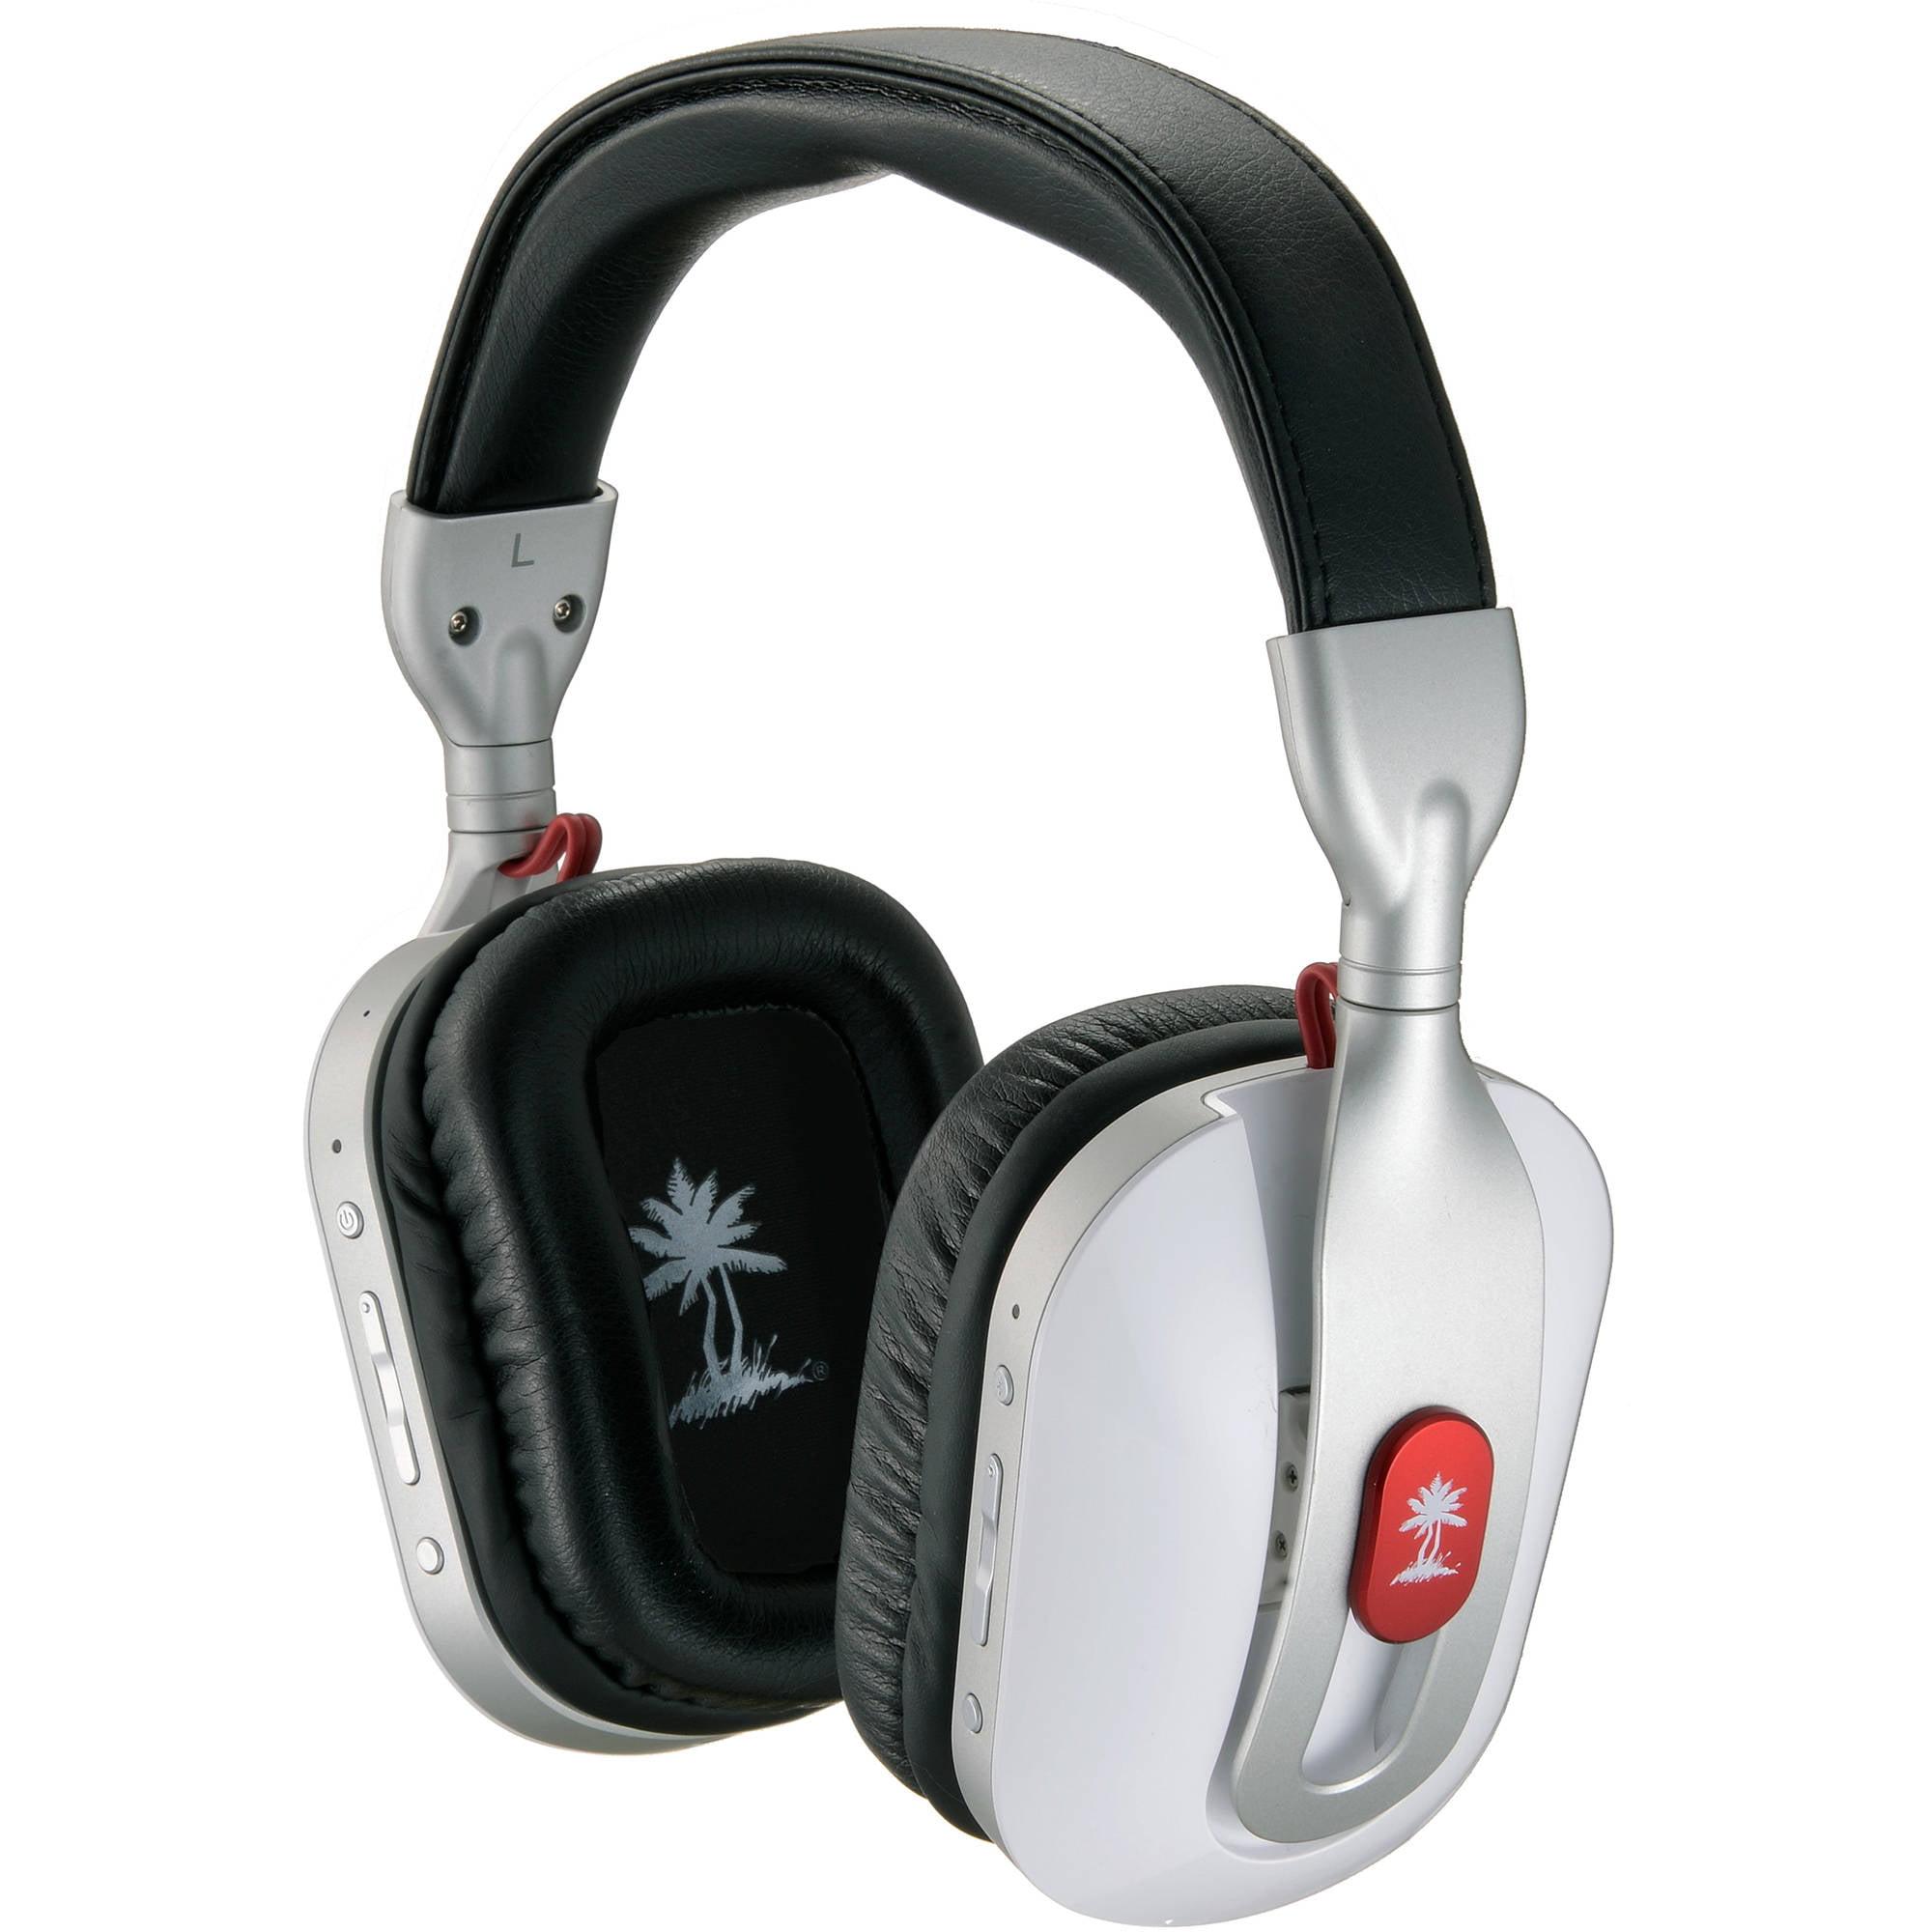 Turtle Beach i30 Bluetooth Noise-Canceling Headset, TBS-7010-01